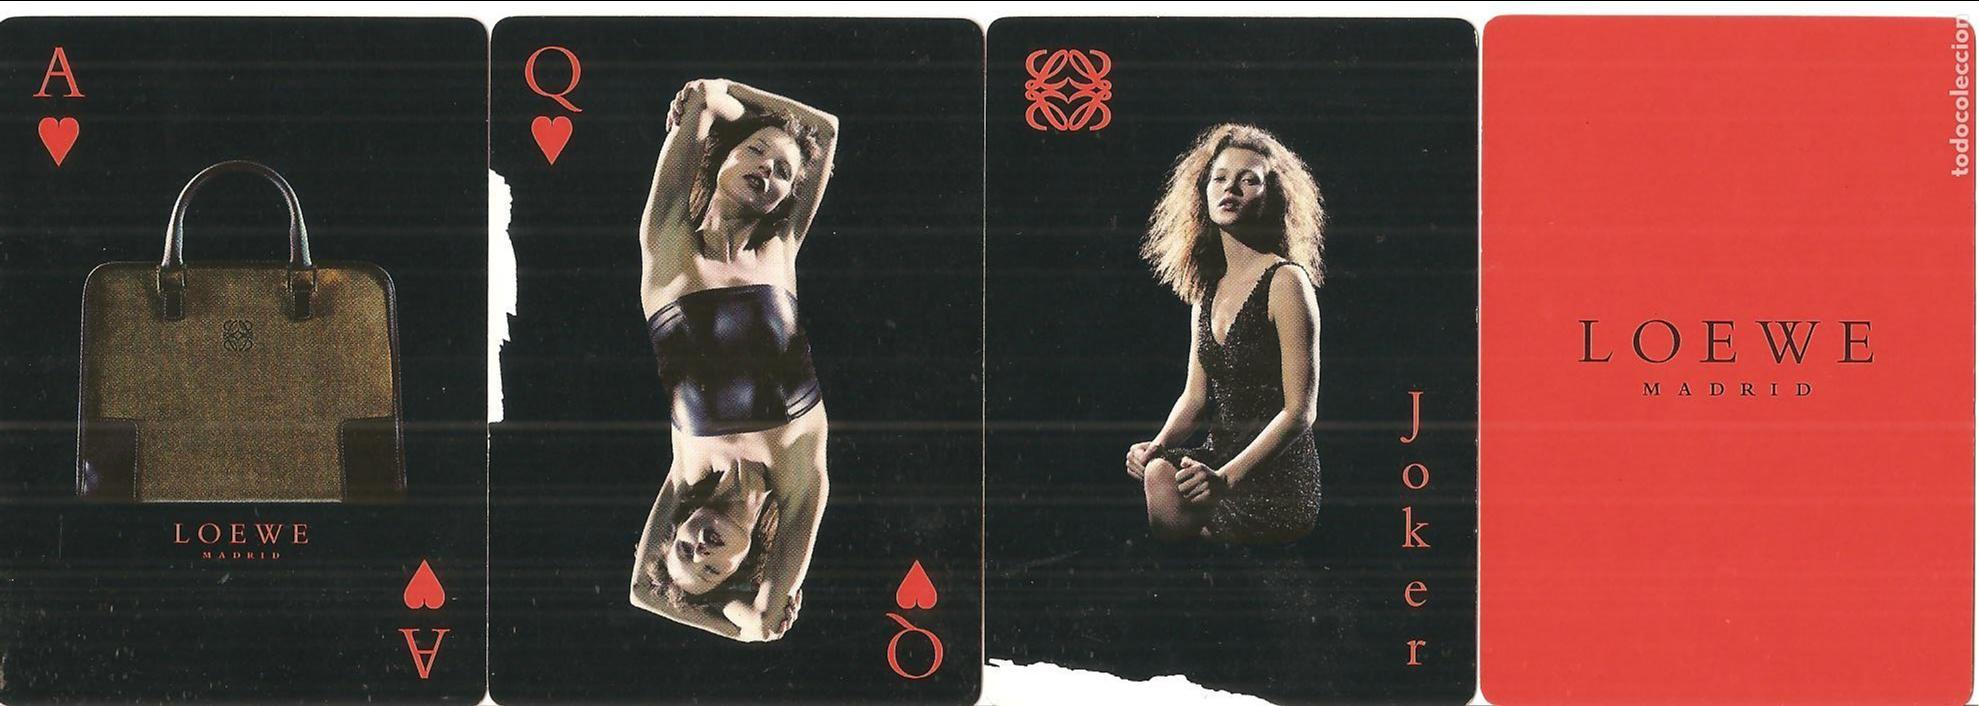 BARAJA, LOEWE-MADRID, POKER, NUEVA, 52 NAIPES + 3 JOKER (Juguetes y Juegos - Cartas y Naipes - Barajas de Póker)